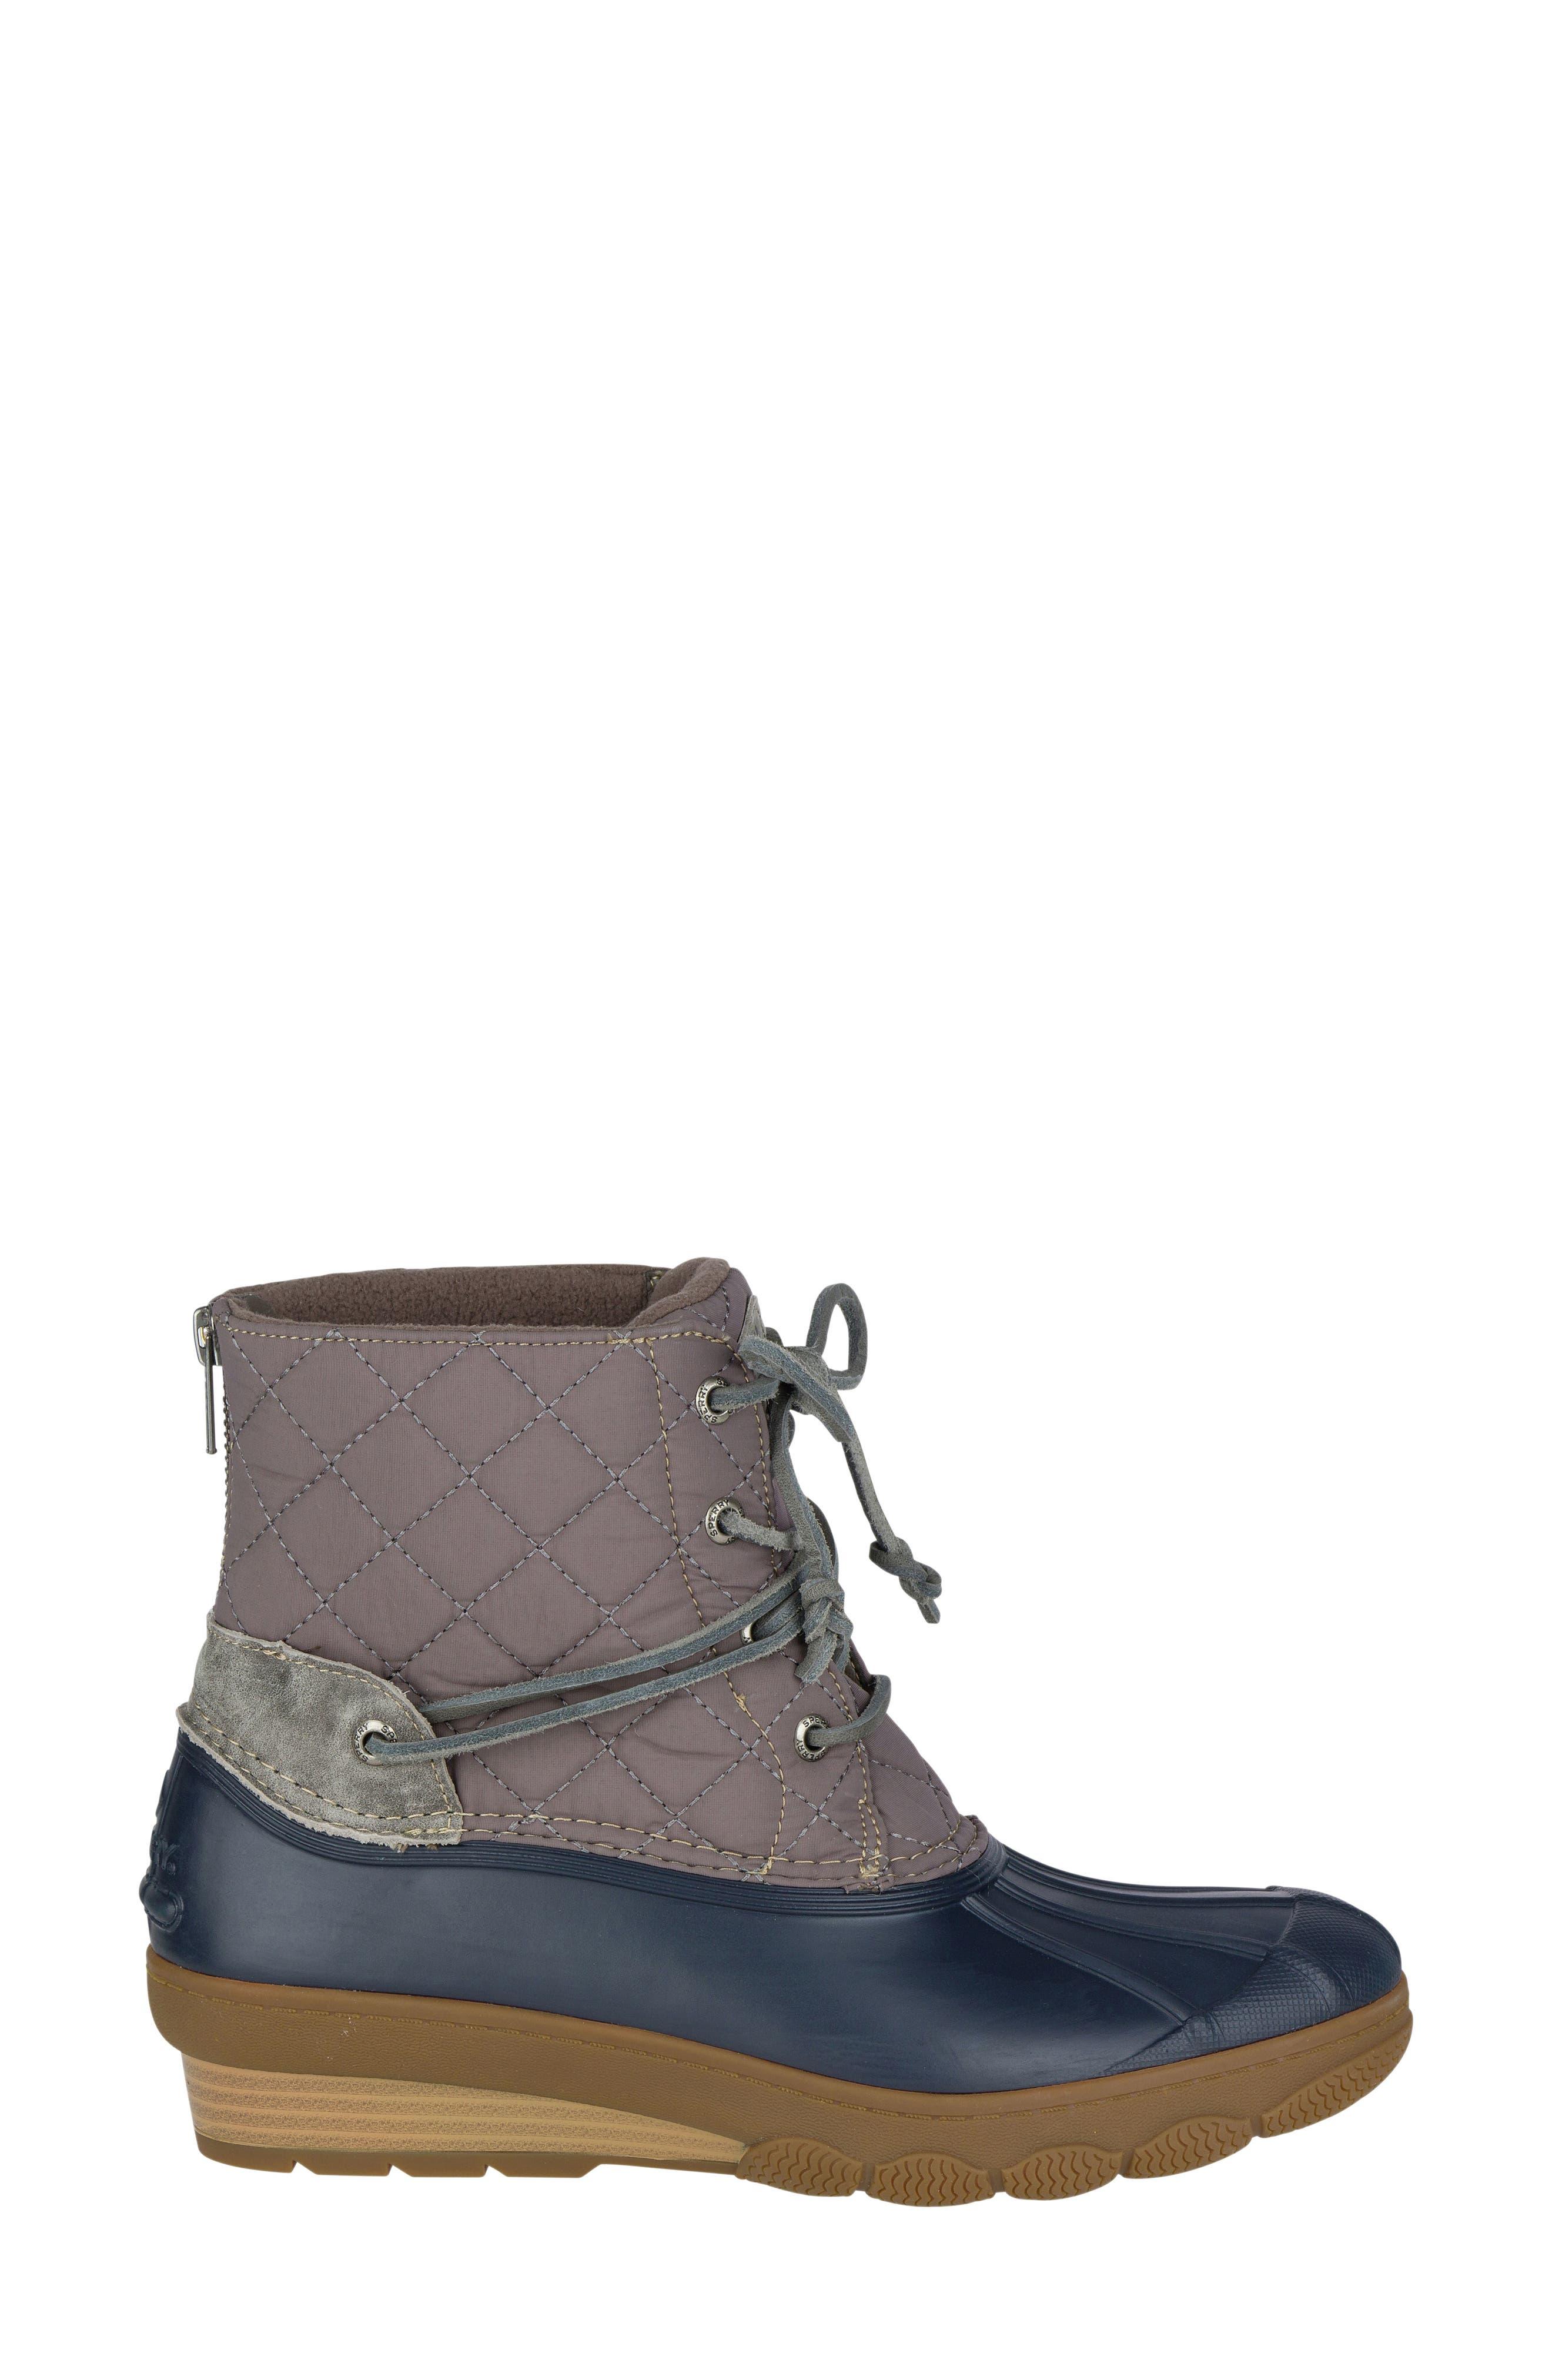 Alternate Image 4  - Sperry Saltwater Quilted Watperproof Boot (Women)